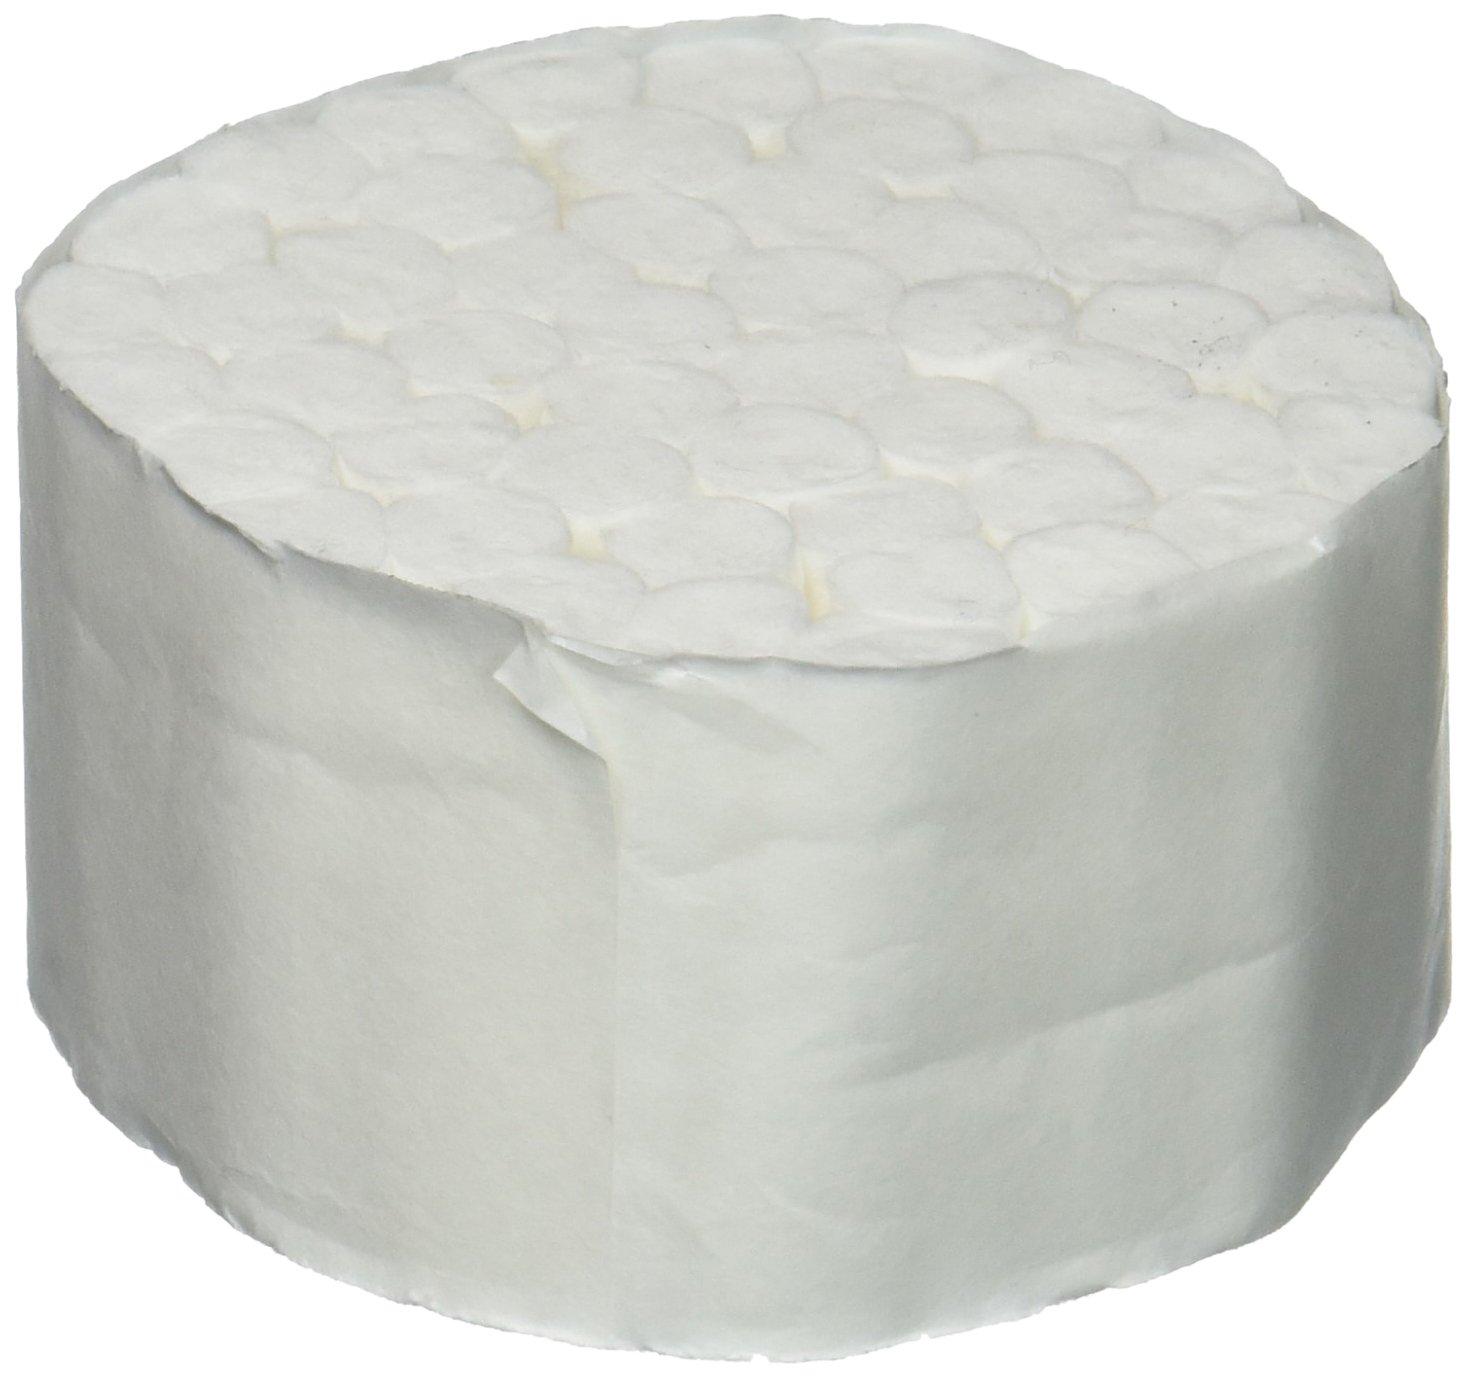 Medicom 4554 Dental Cotton Roll, 2, Medium, Non-Sterile, 1-1/2'' Diameter, 3/8'' Length (Pack of 2000)